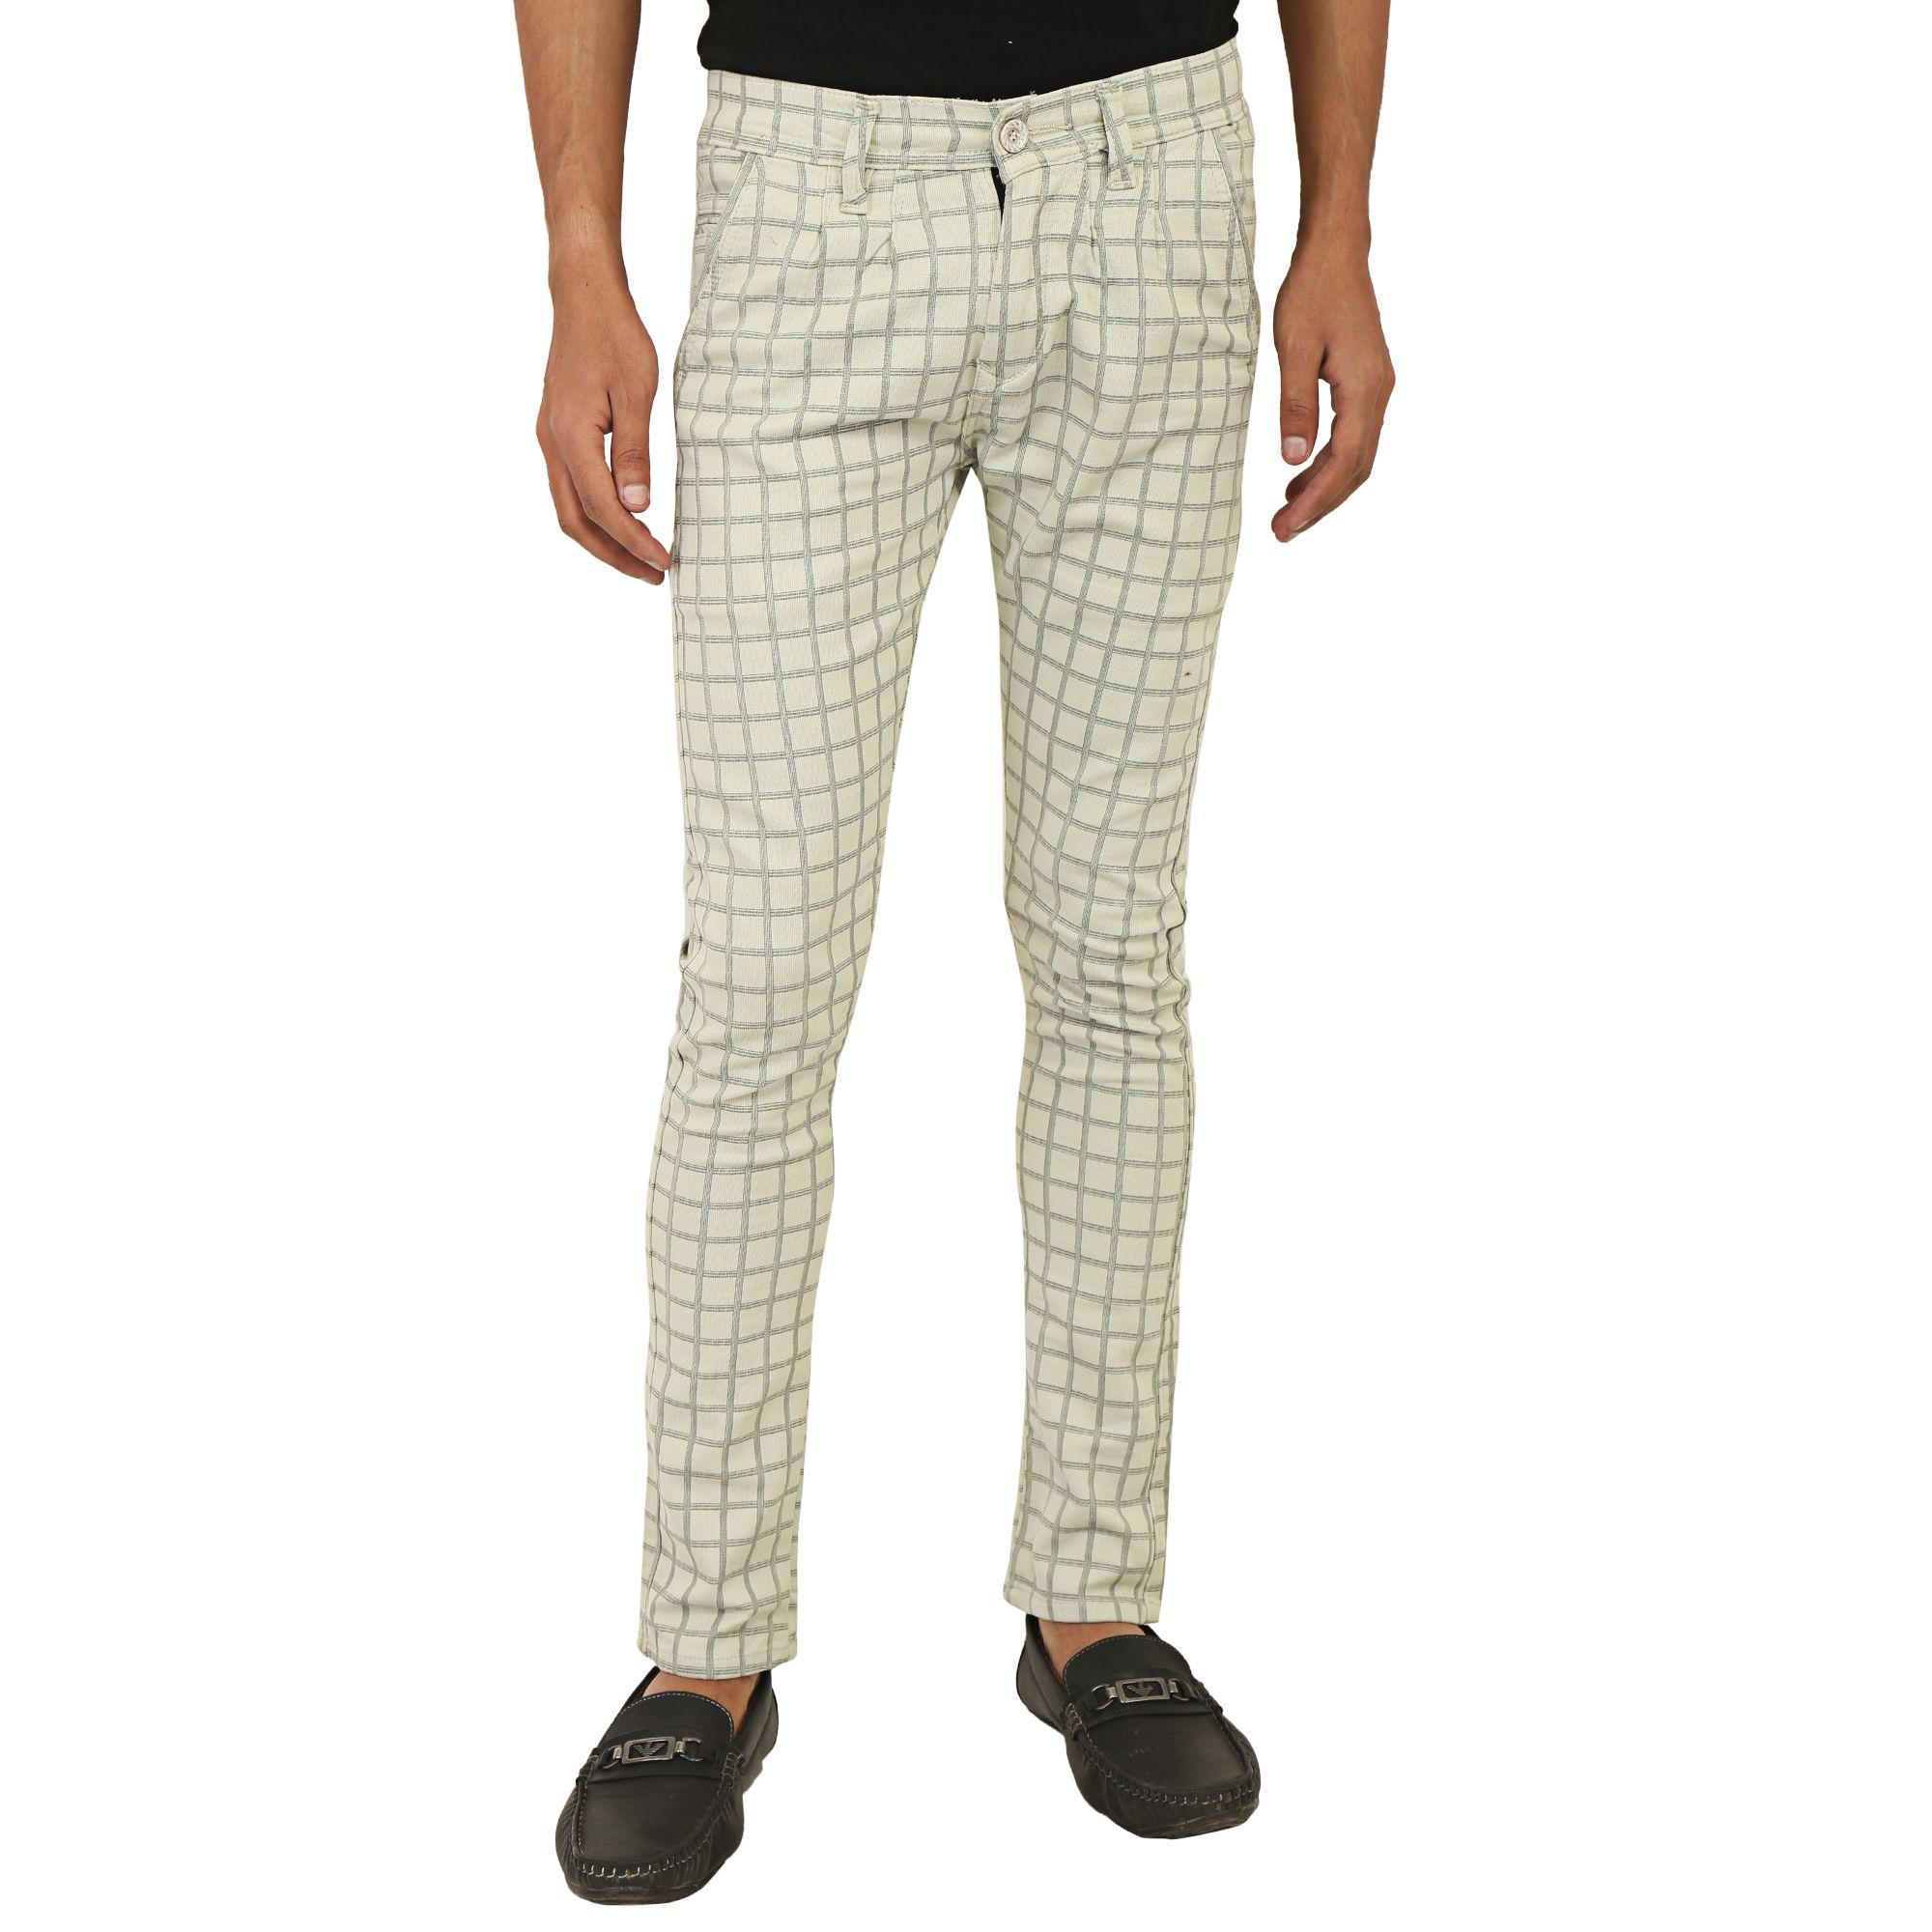 Roles Beige Regular -Fit Flat Trousers